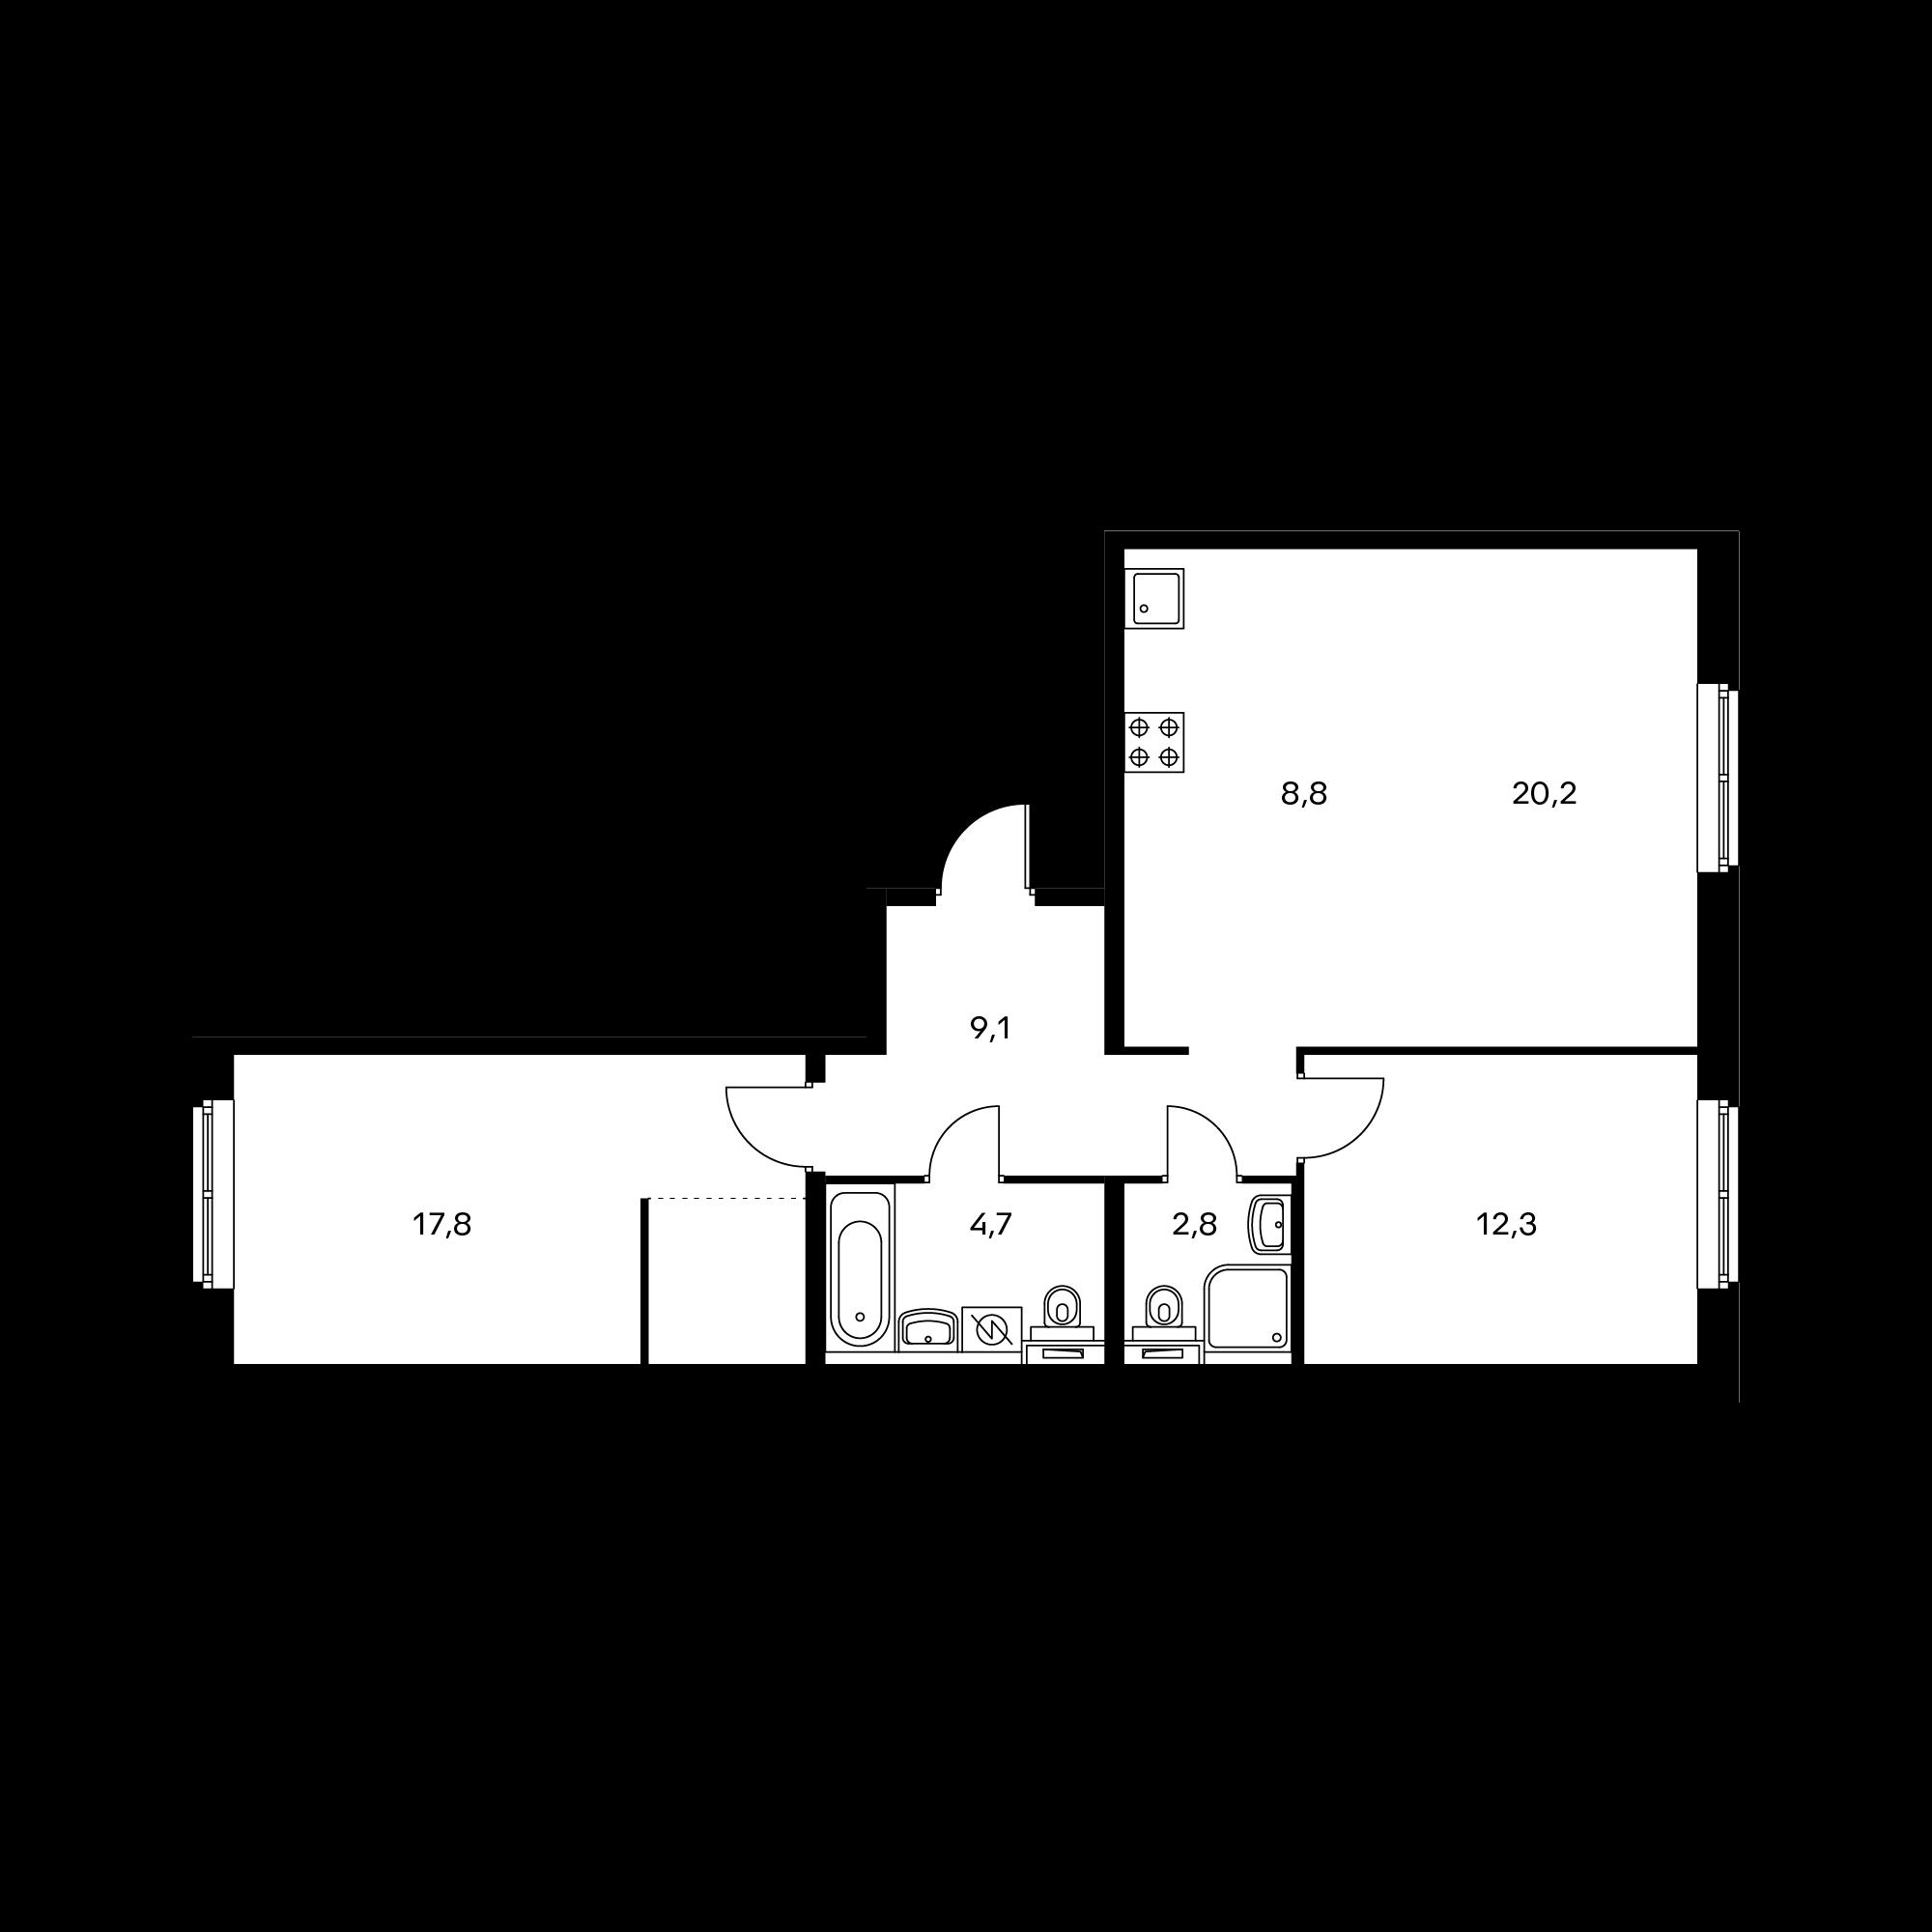 3KM12_8.4-1_S_Z